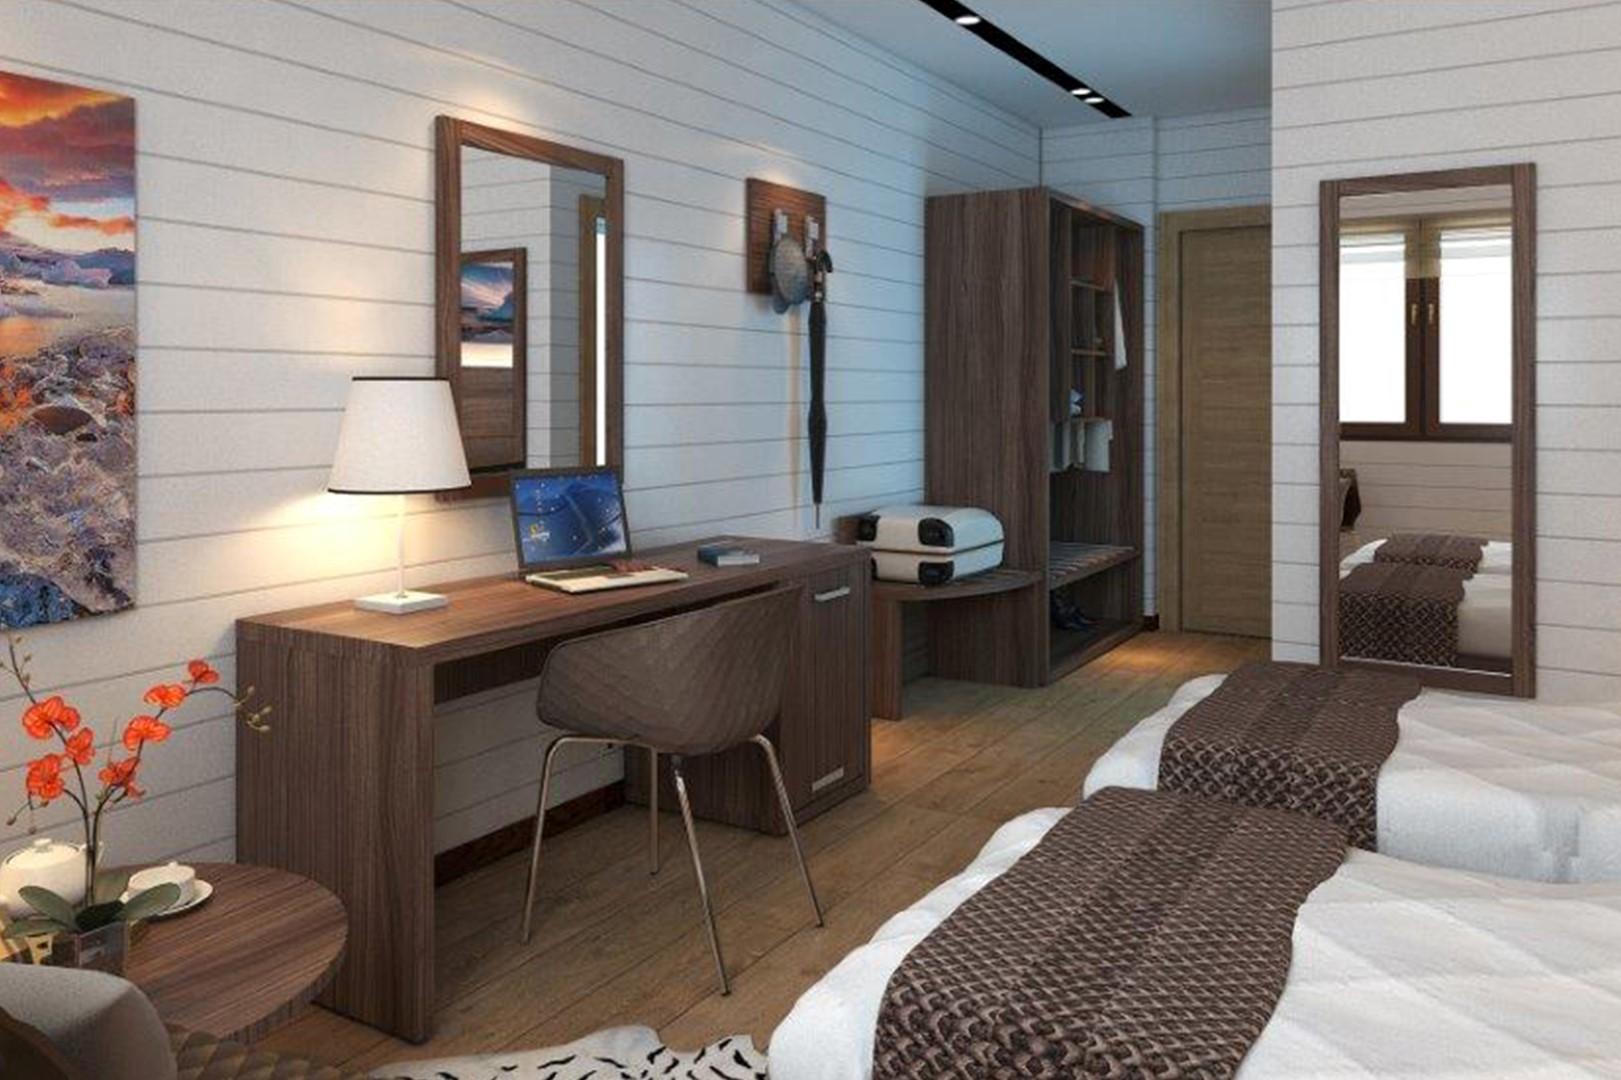 furniture_0005_2.twin room_hotel furniture (4)